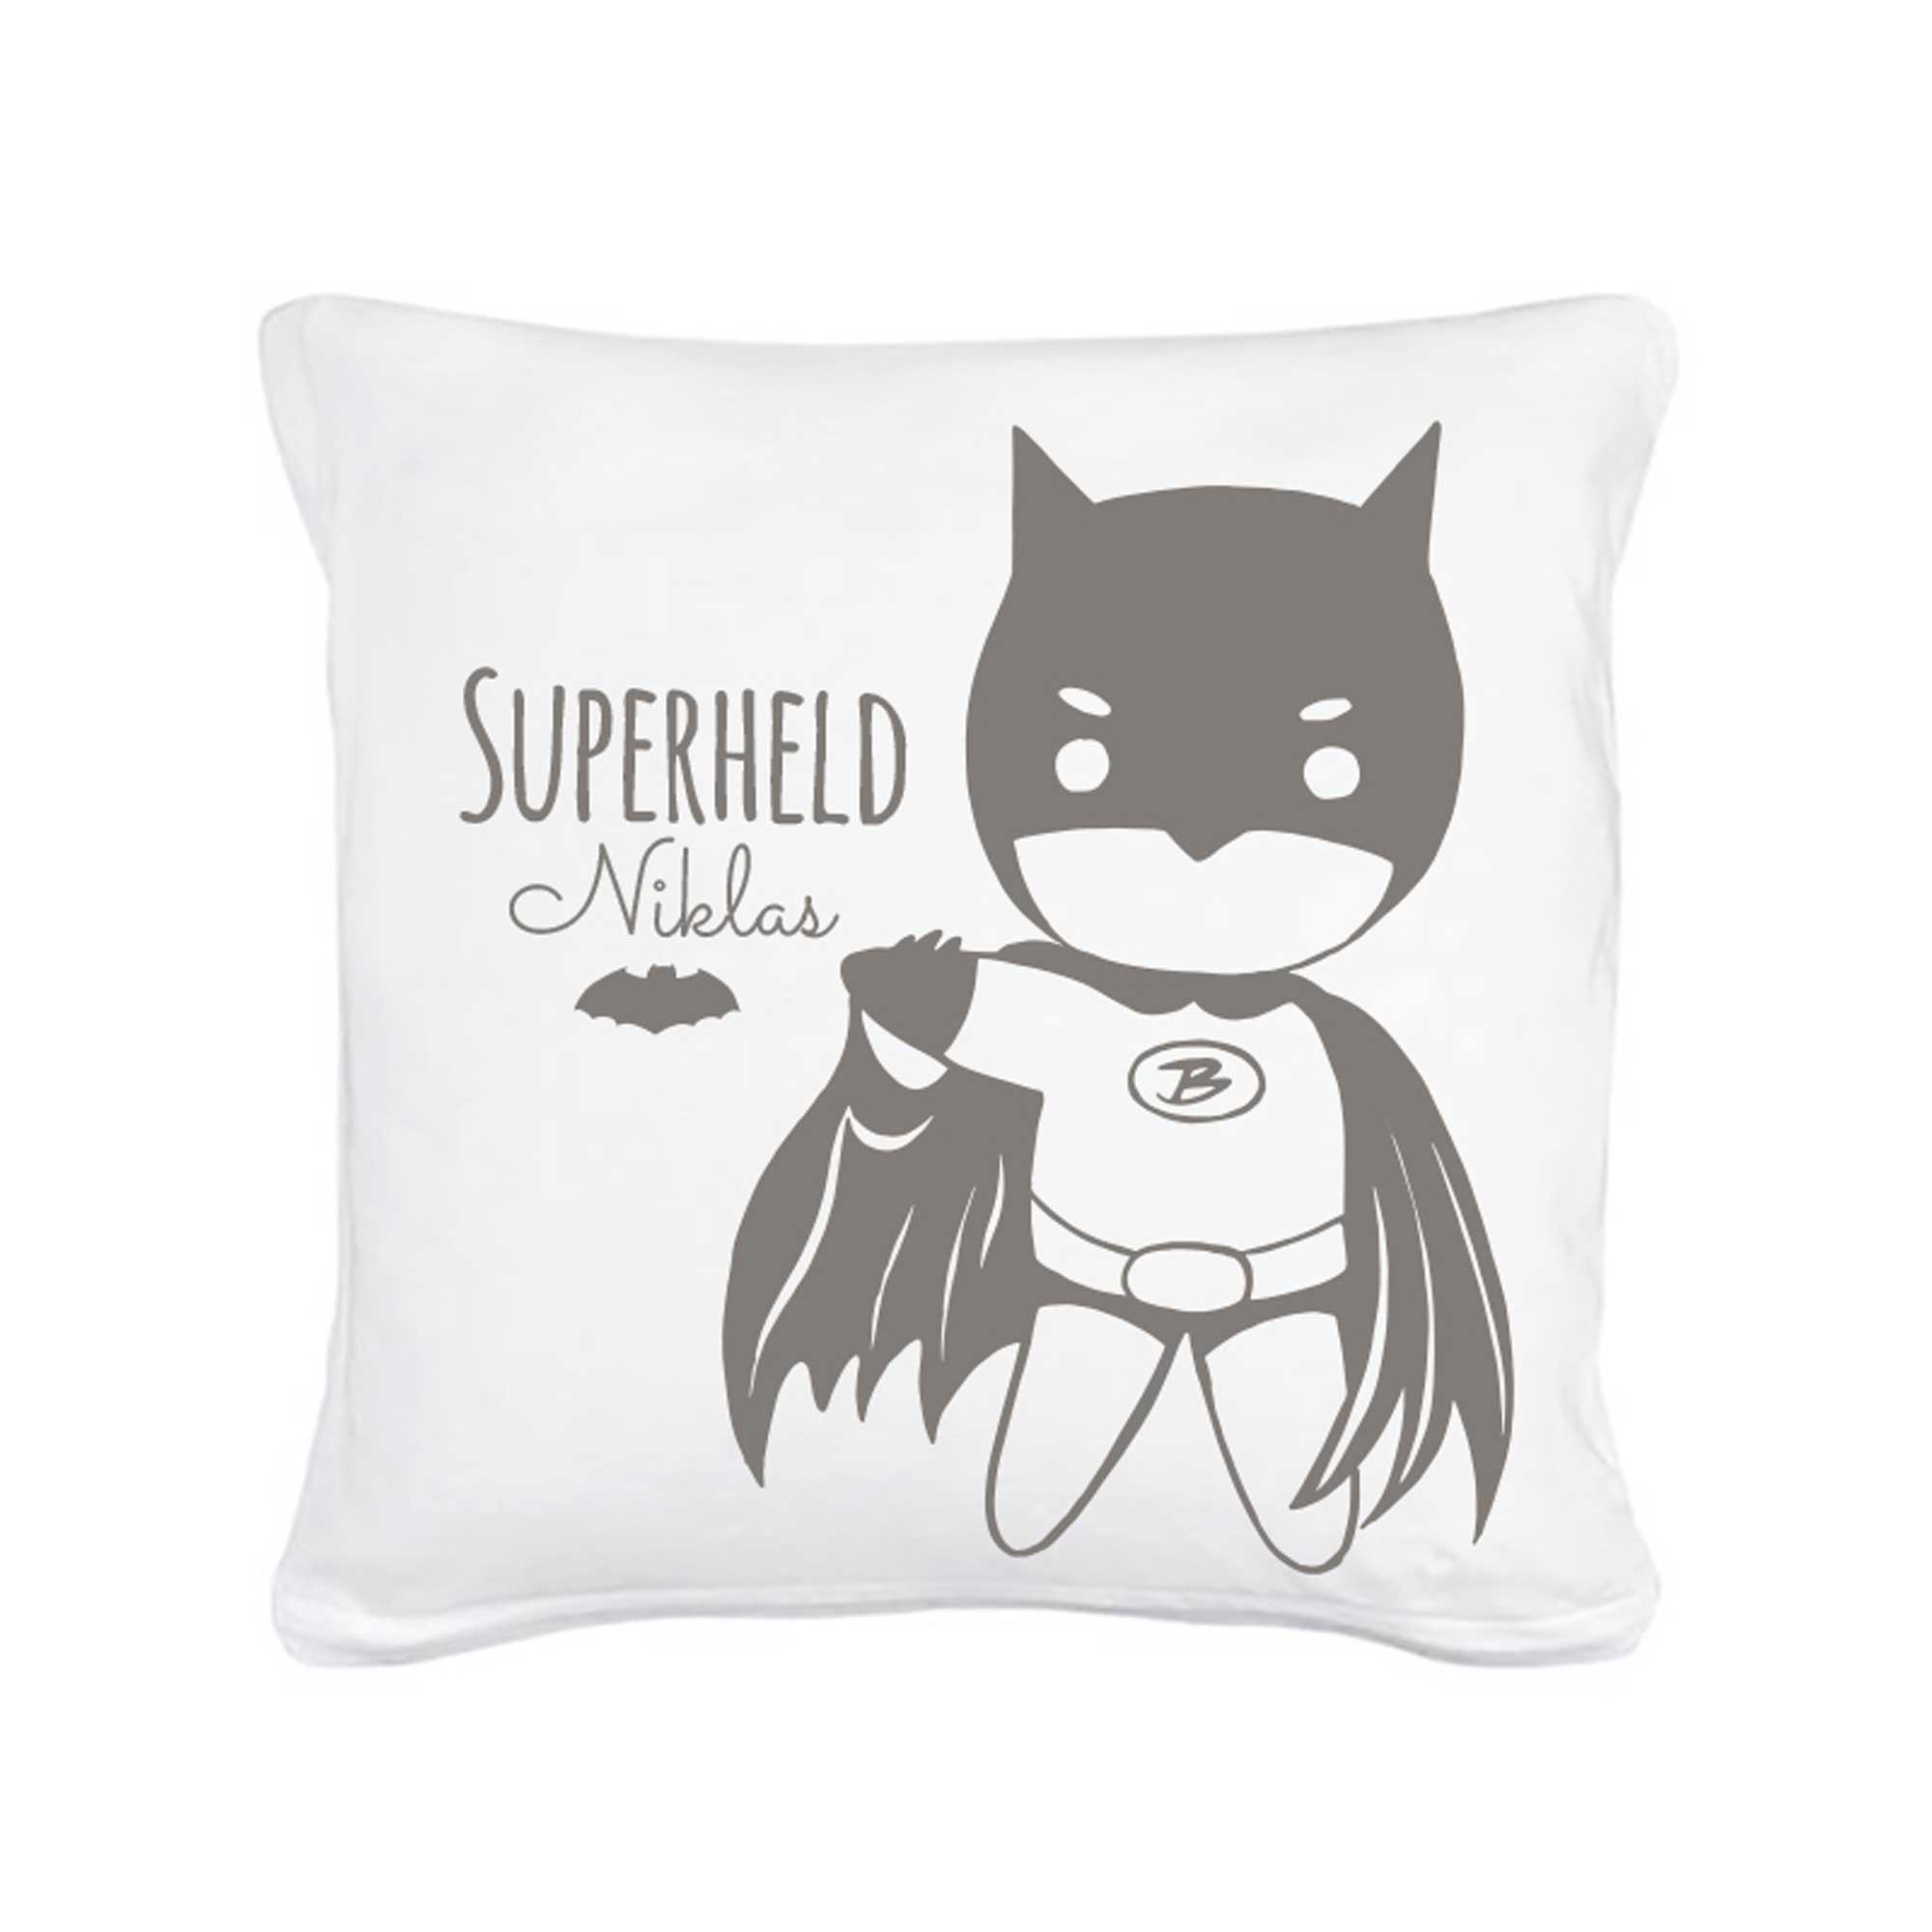 superheld mit k